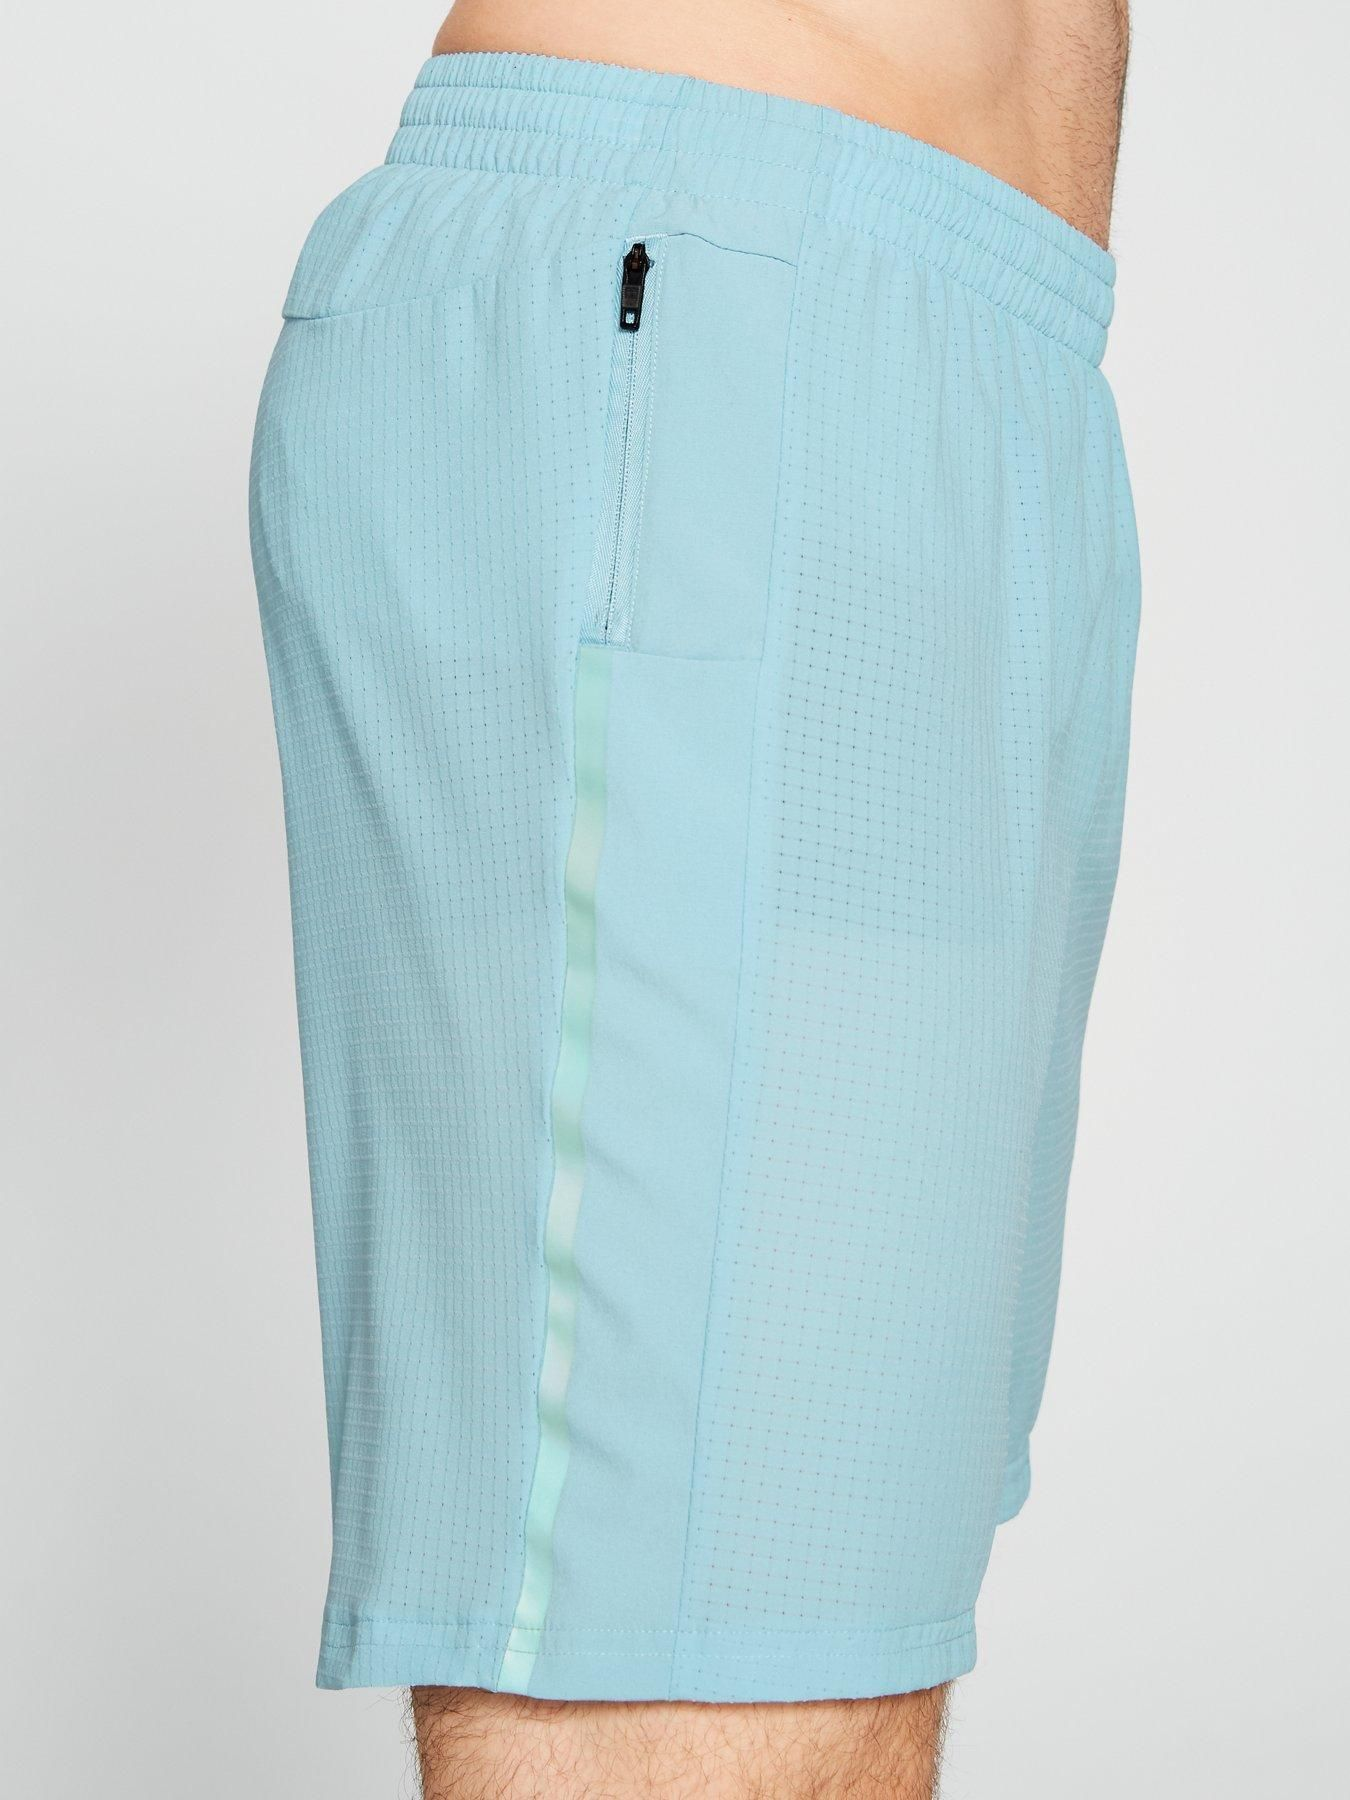 periódico caos aluminio  adidas Supernova 7-Inch Running Shorts - Light Blue #lightblueshorts Adidas  Supernova 7-Inch Running Shorts - … in 2020 | Adidas supernova, Running  shorts, Light blue denim